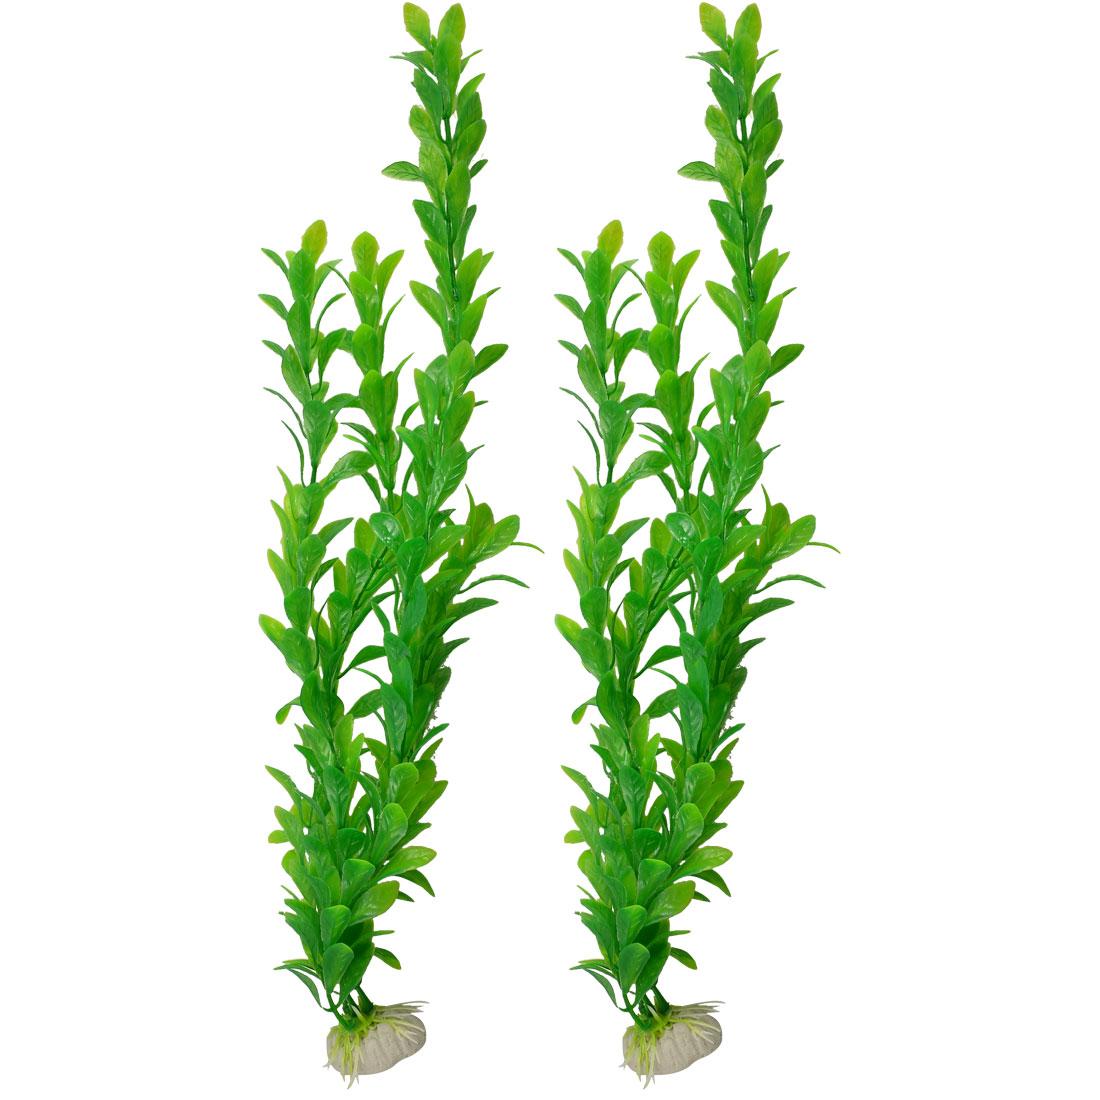 "17"" Height Fish Tank Plastic Green Artificial Plants Ornament 2 Pcs"